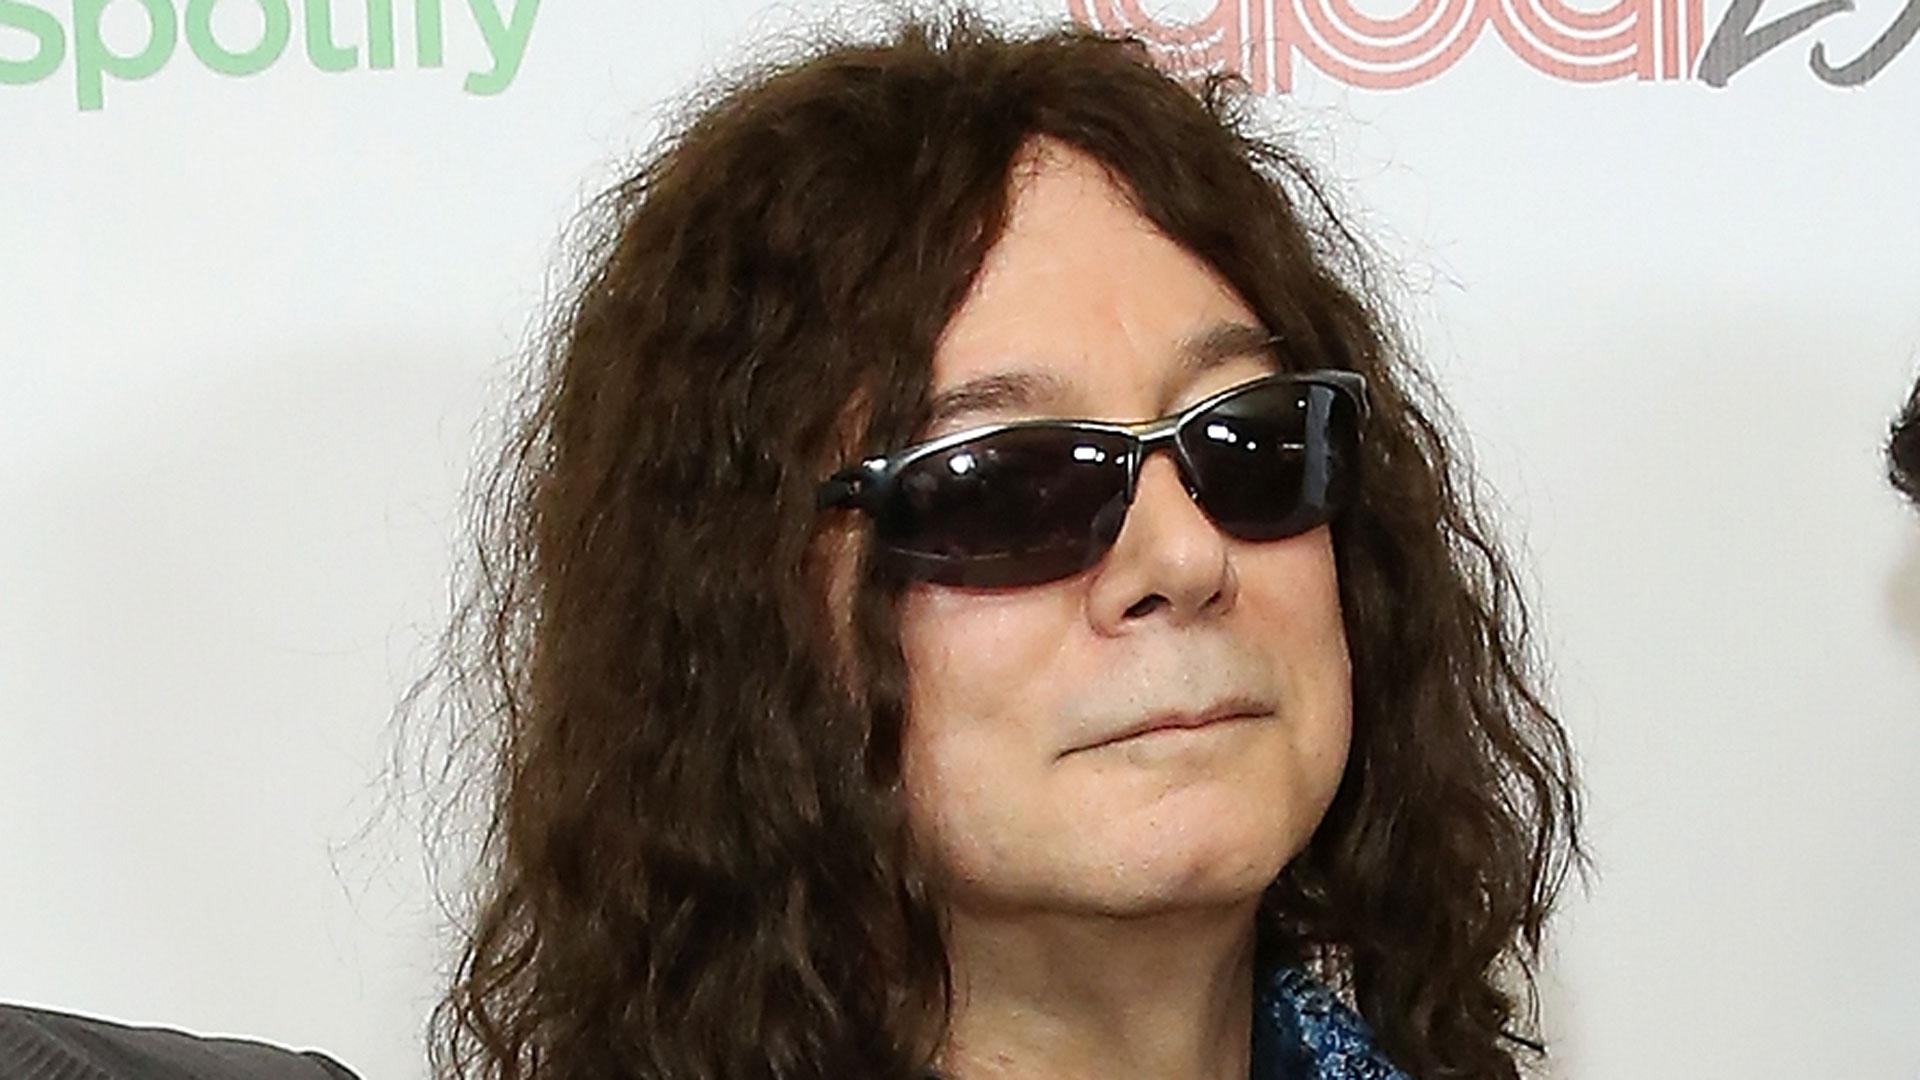 Alan Merrill, 'I love Rock 'n' Roll' songwriter, dies from coronavirus | Fox 59